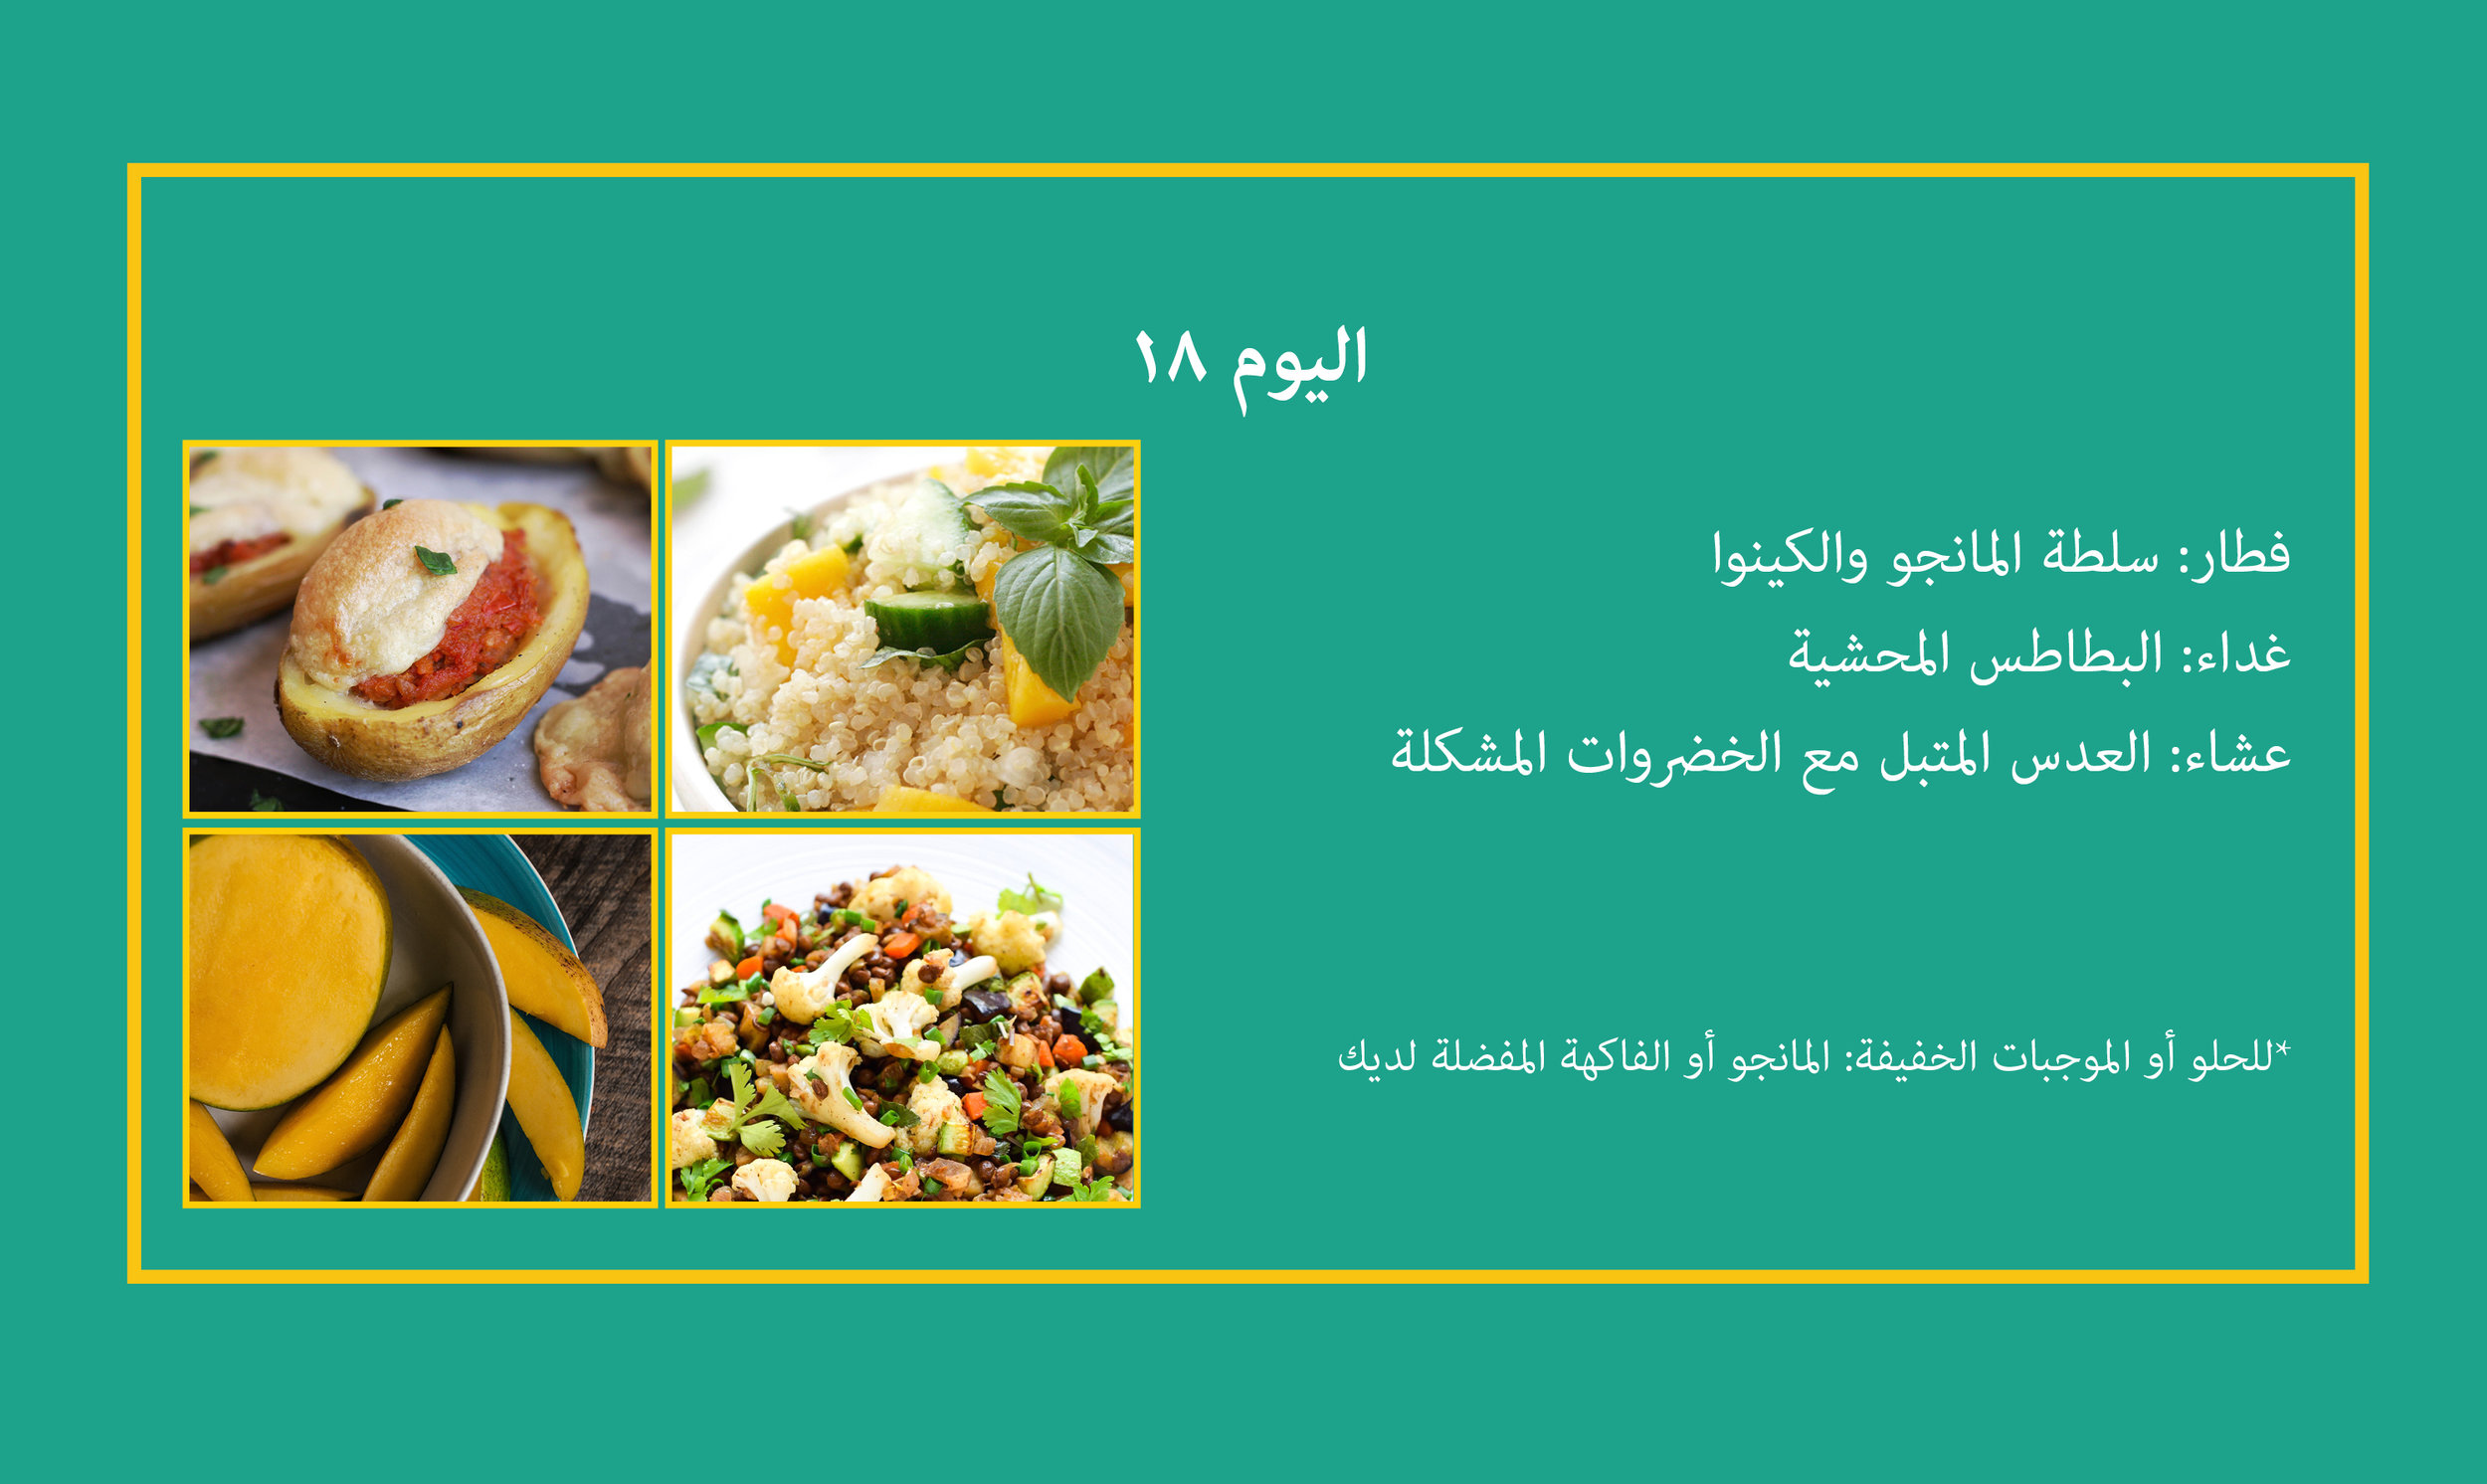 Day 18 Arabic.jpg